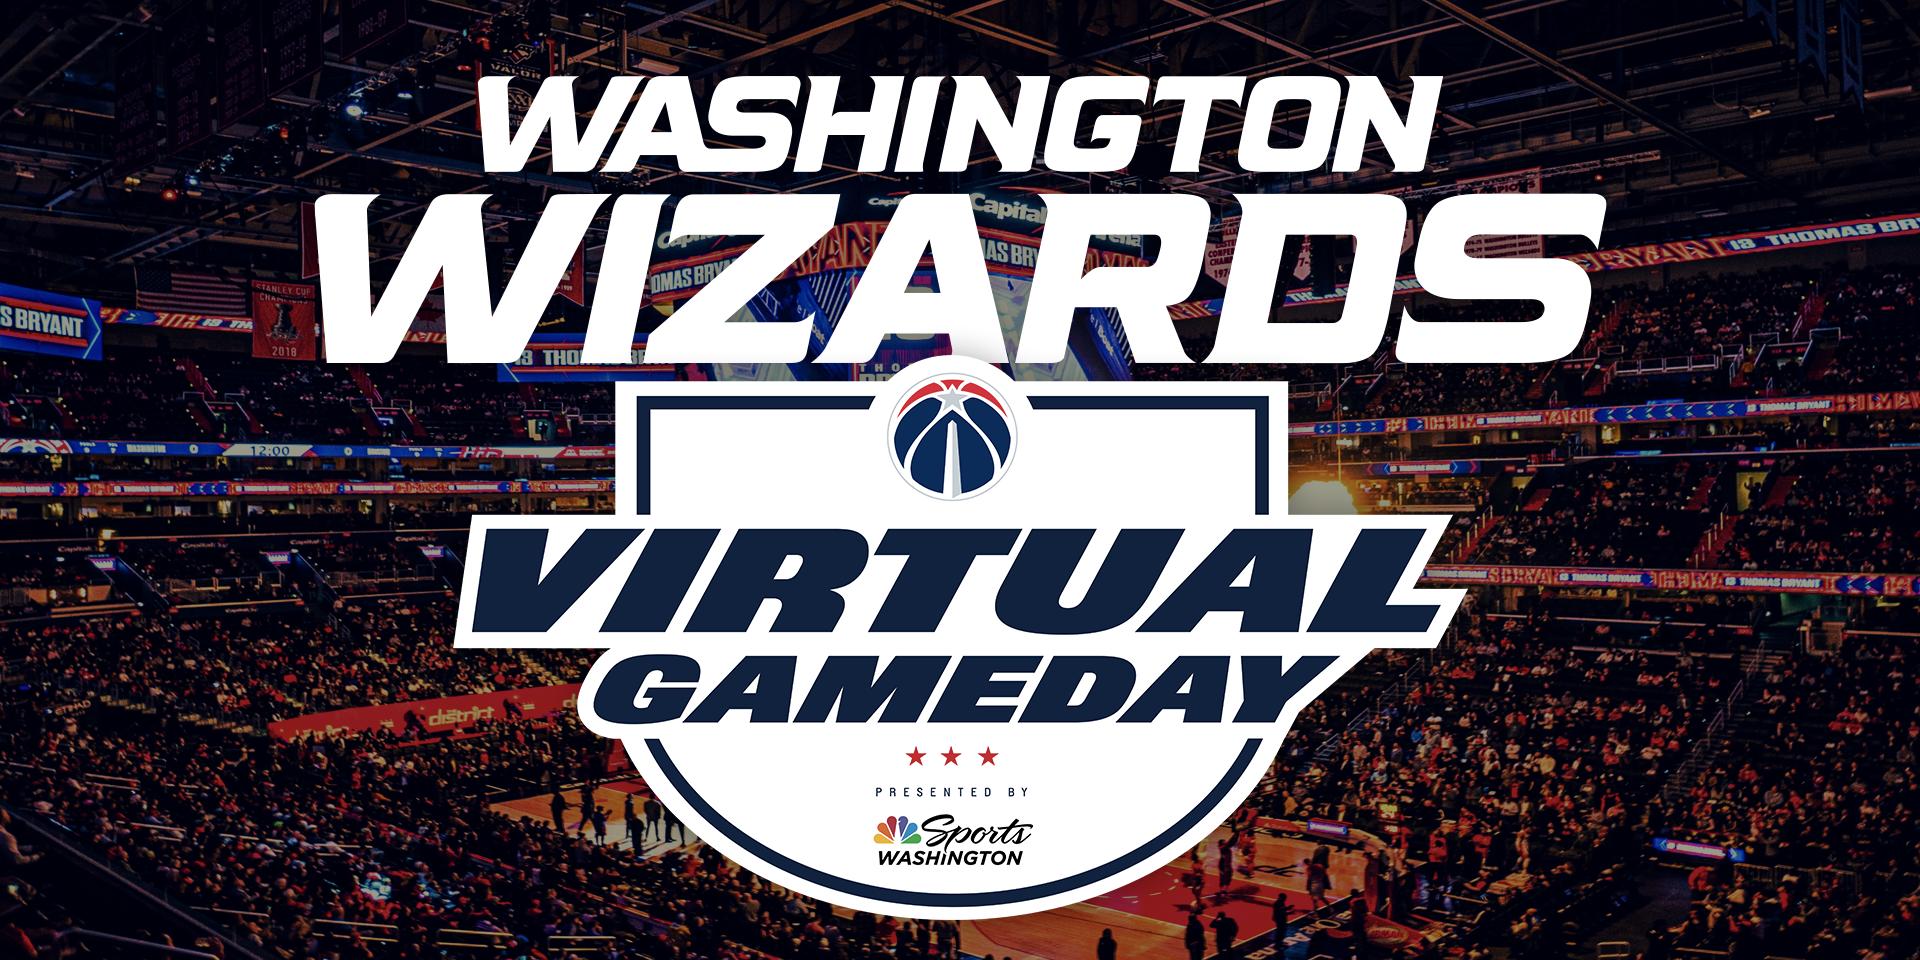 Washington Wizards Virtual Gameday header image